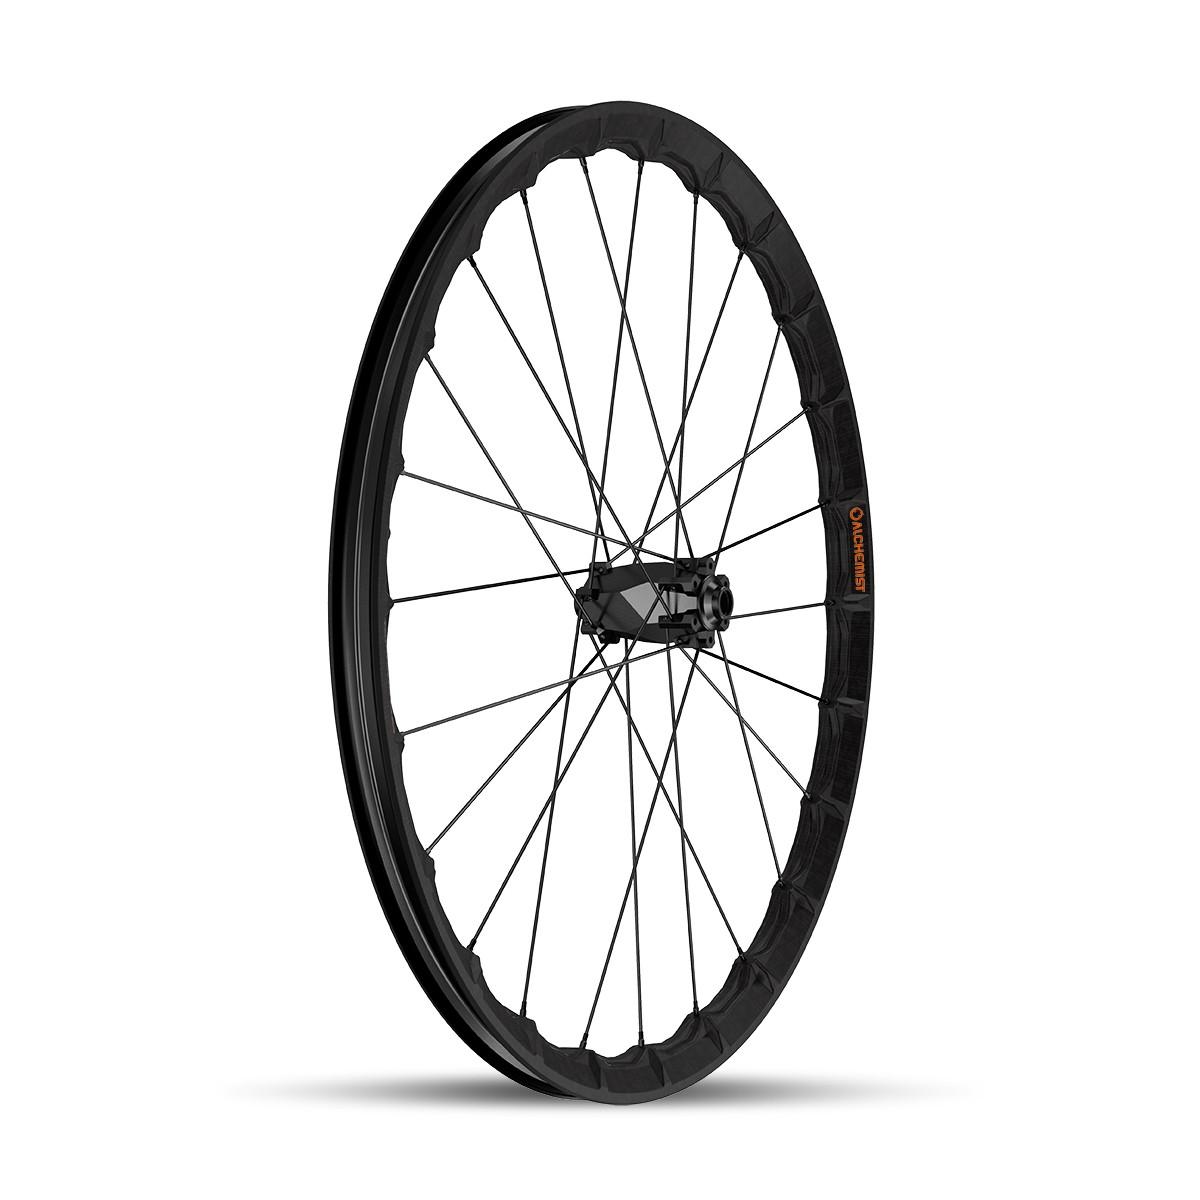 Enduro Carbon Laufrad in 27,5